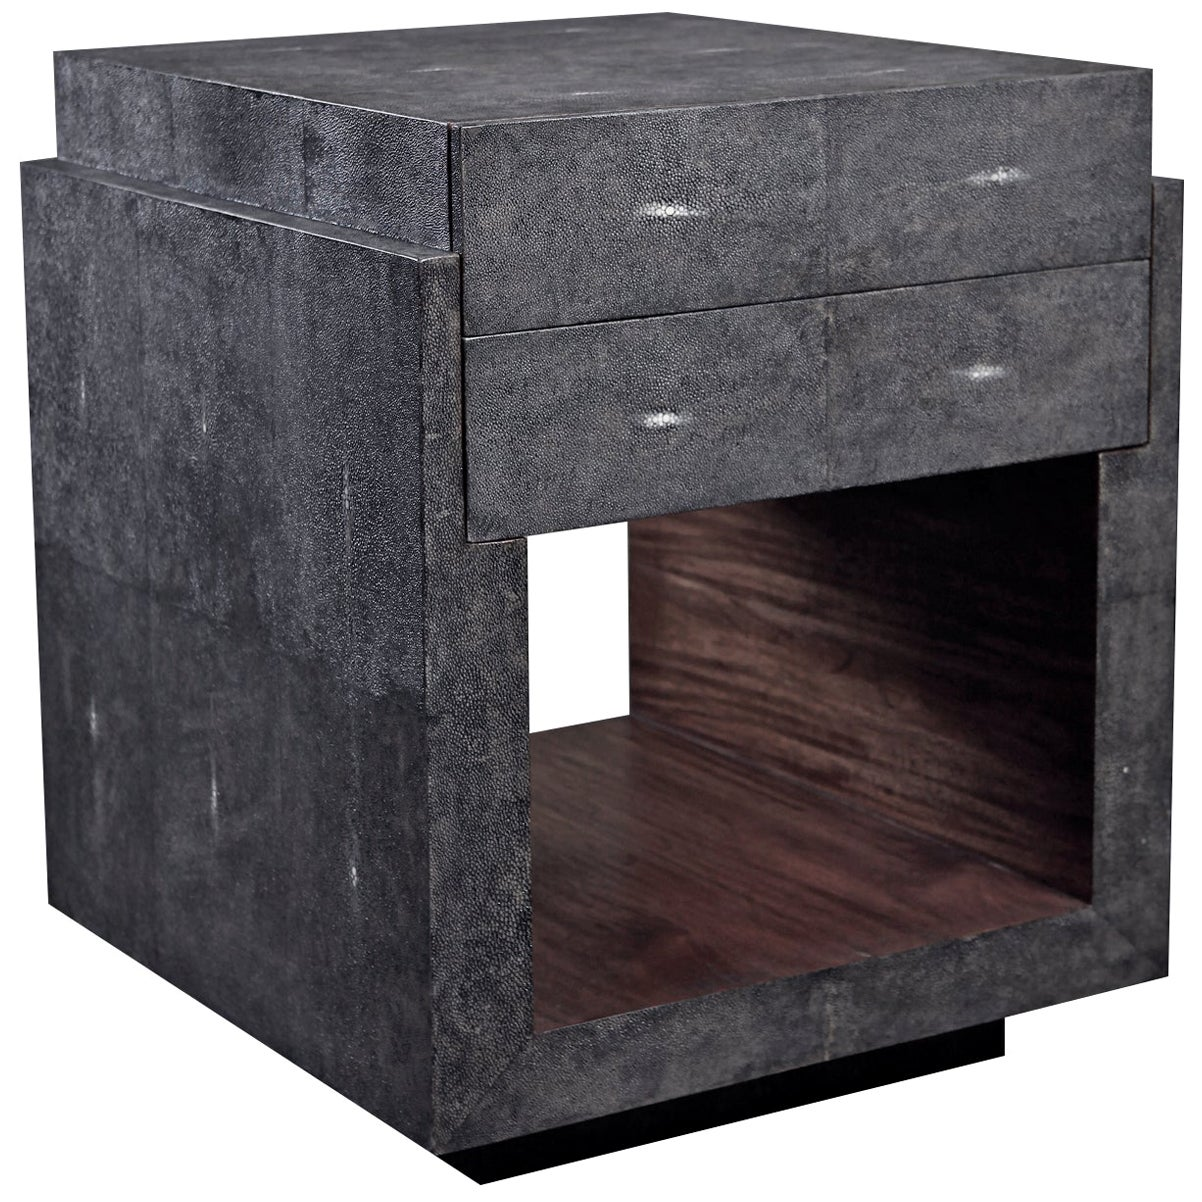 Bedside Table in Black Shagreen by R&Y Augousti